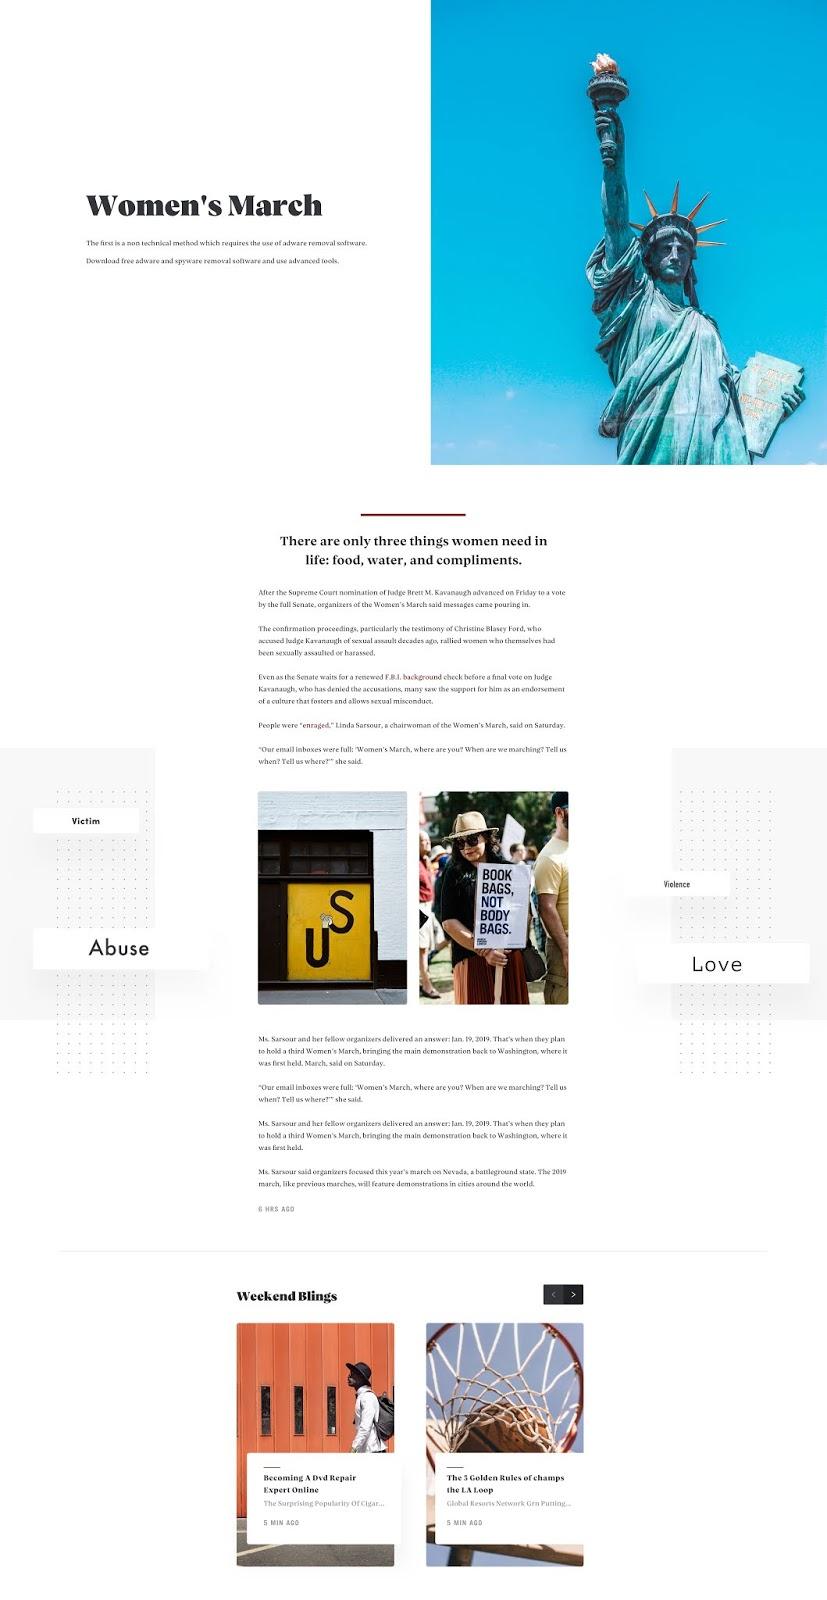 contoh desain web - Artikel New York times